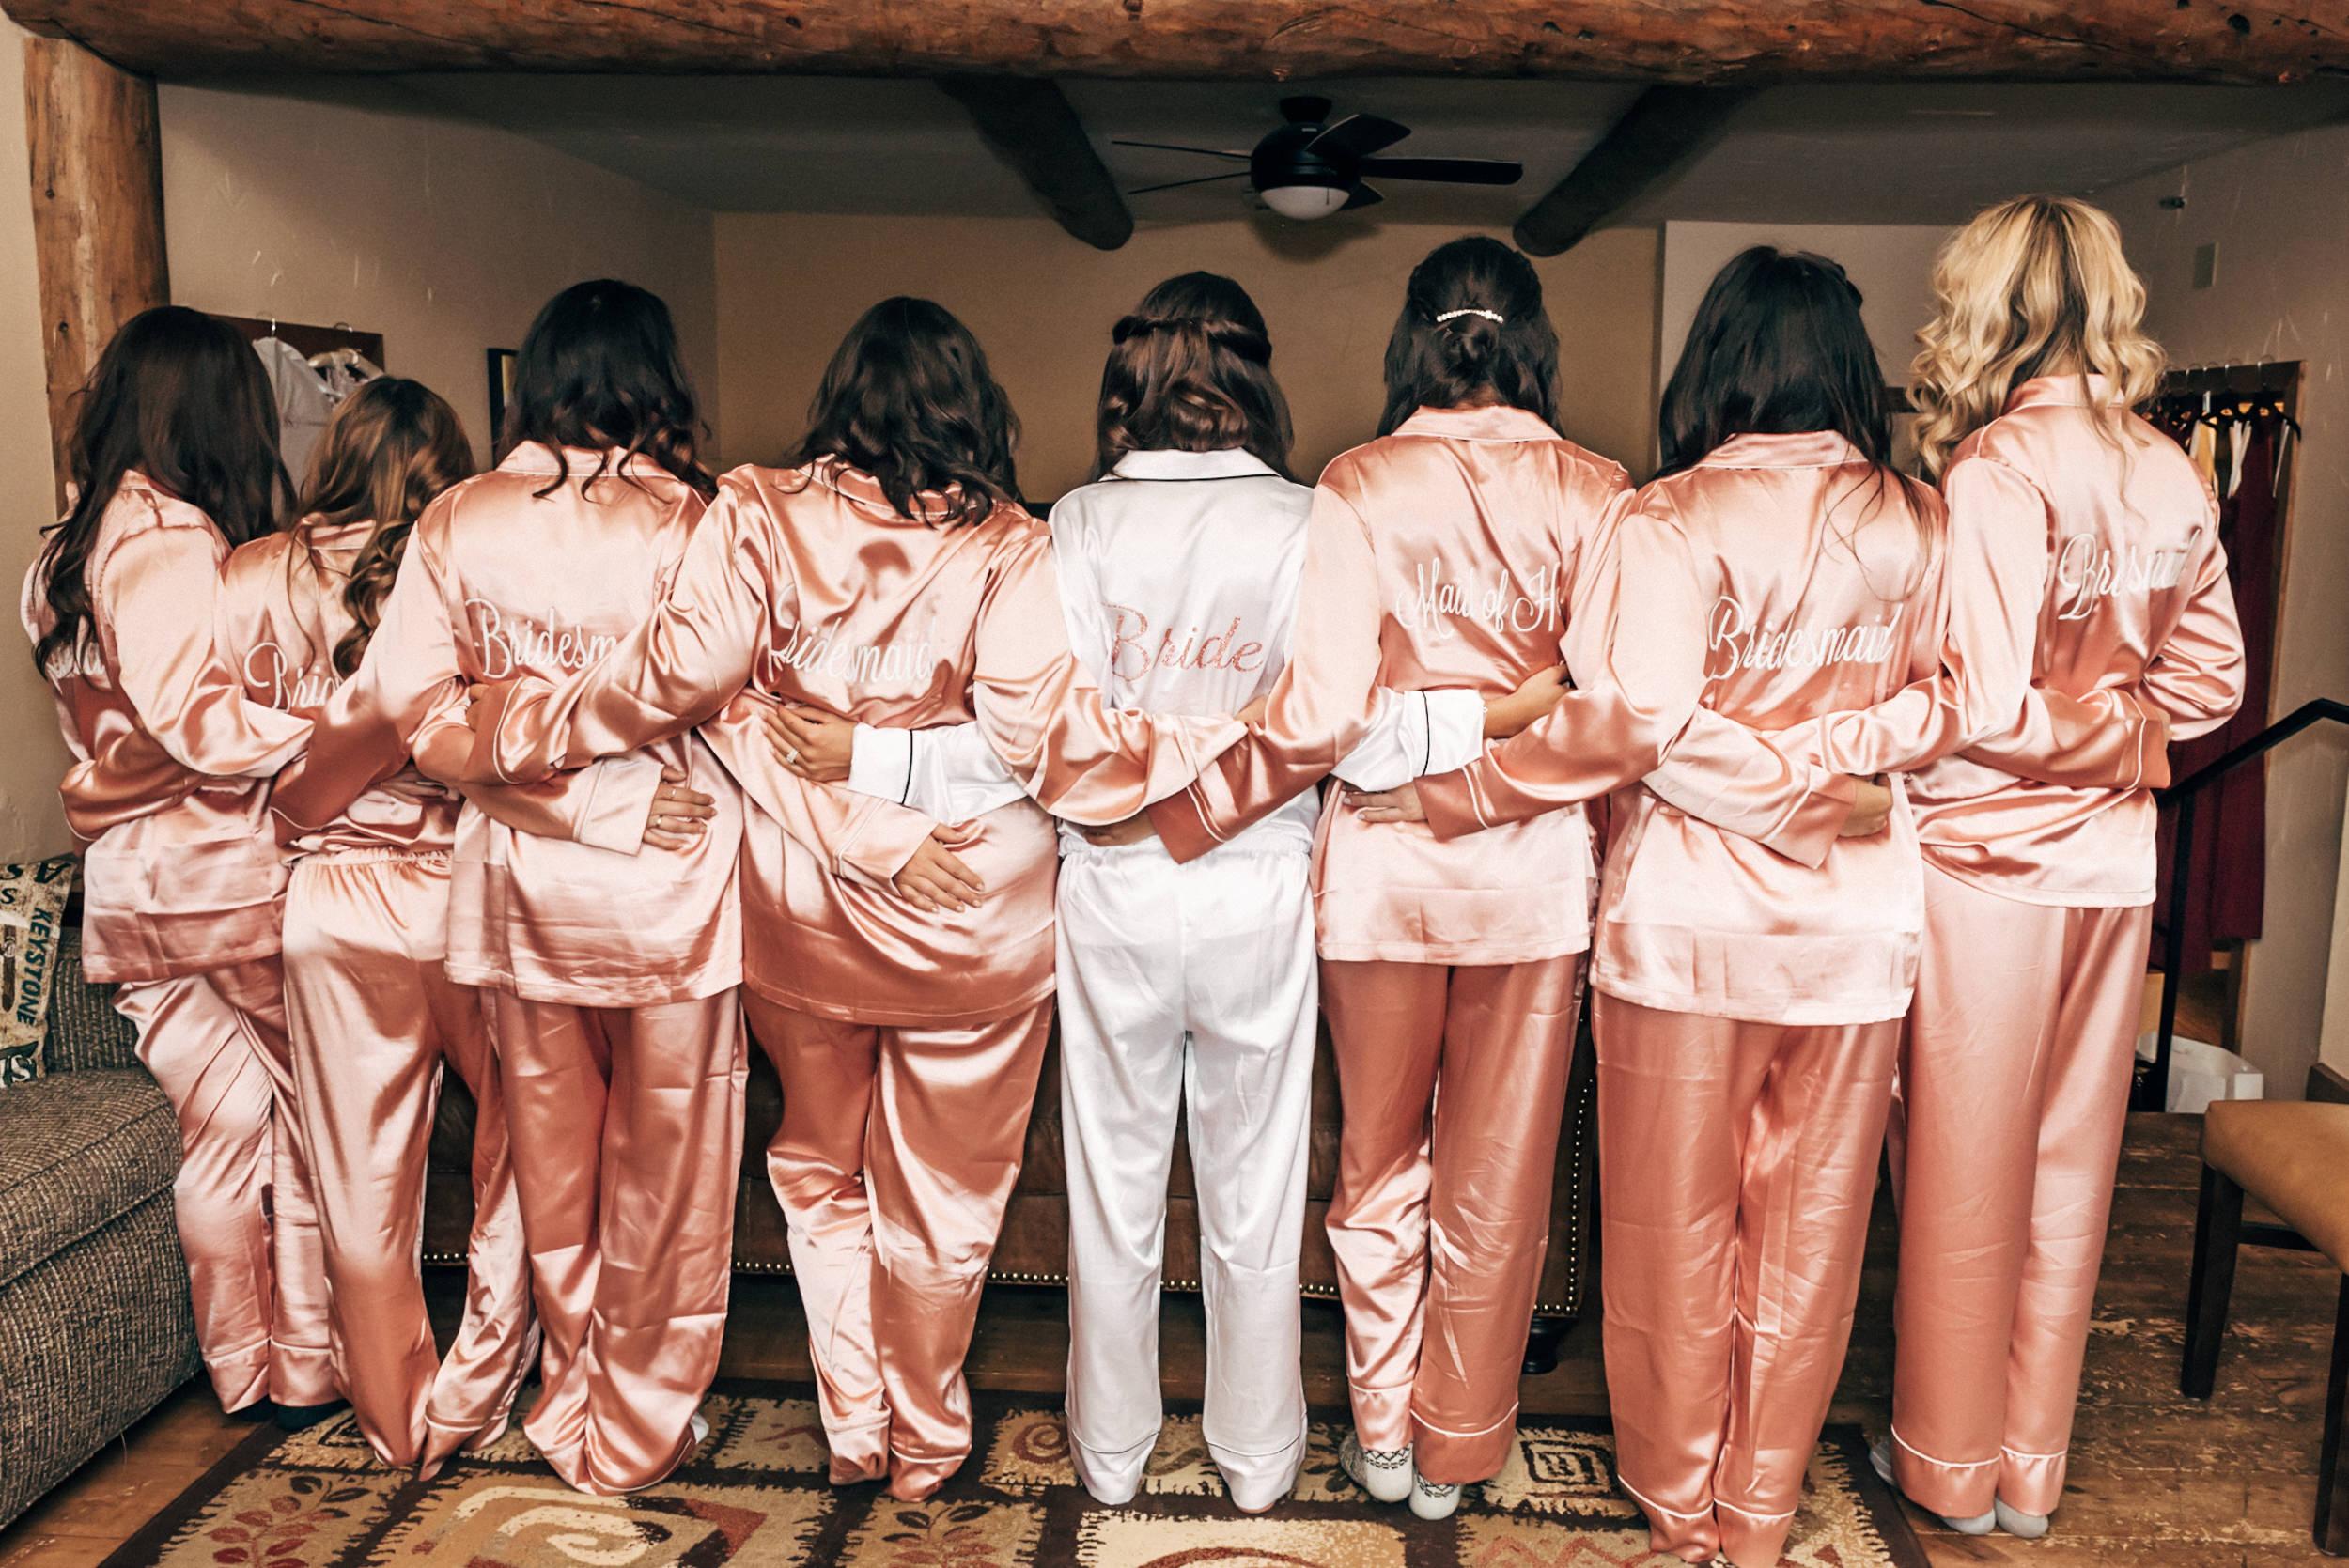 Cute bridesmaids pajamas at Colorado wedding at the Lodge at Breckenridge, Colorado wedding Photographer